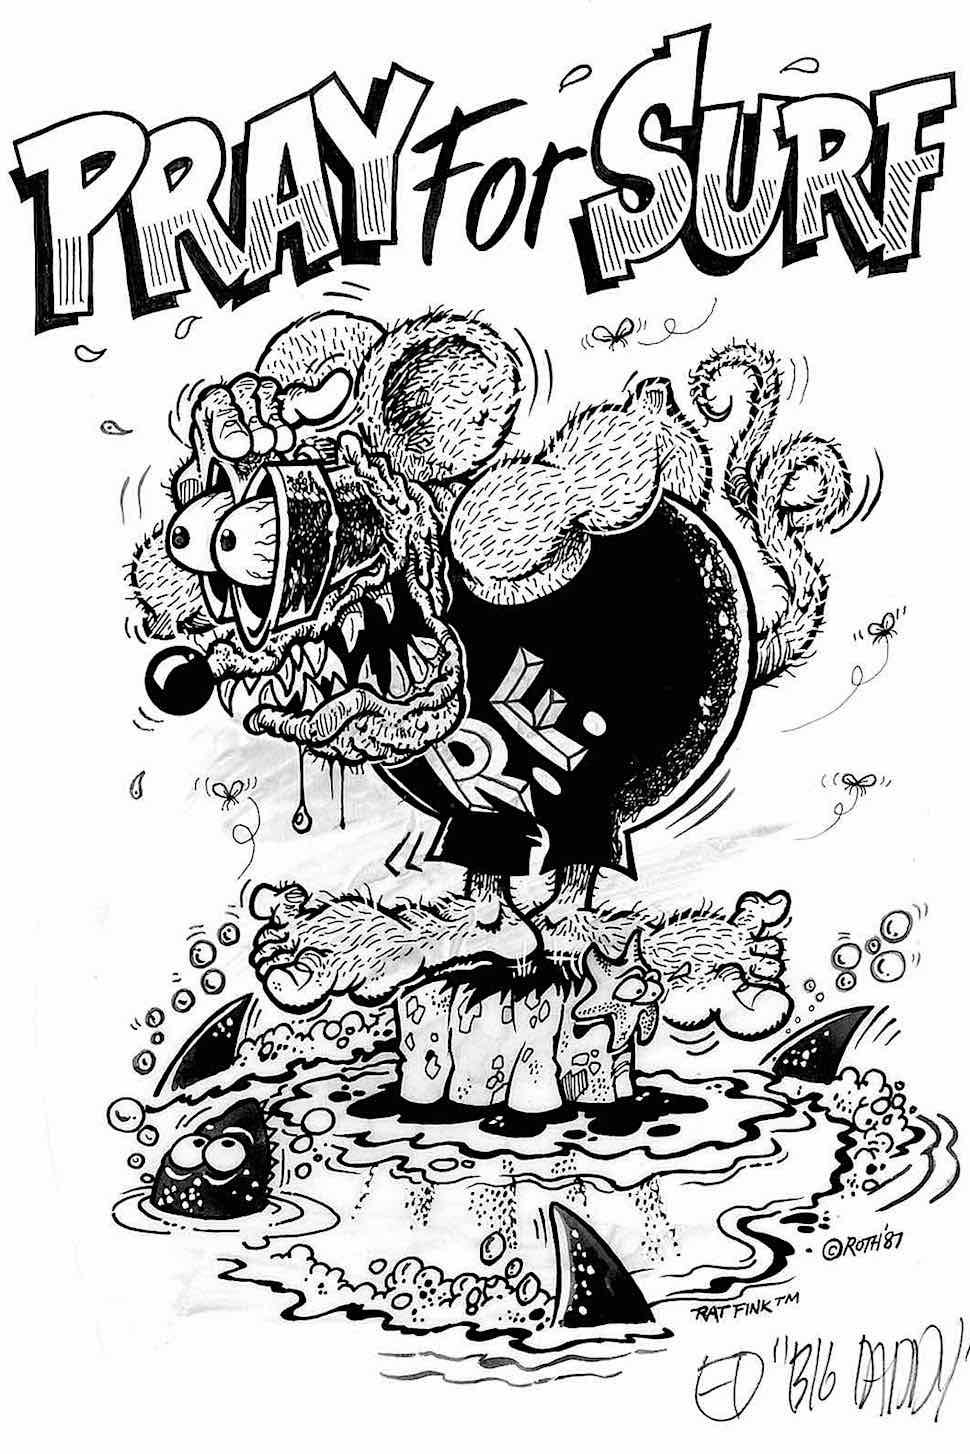 Pray For Surf, Ed Roth's Rat Fink